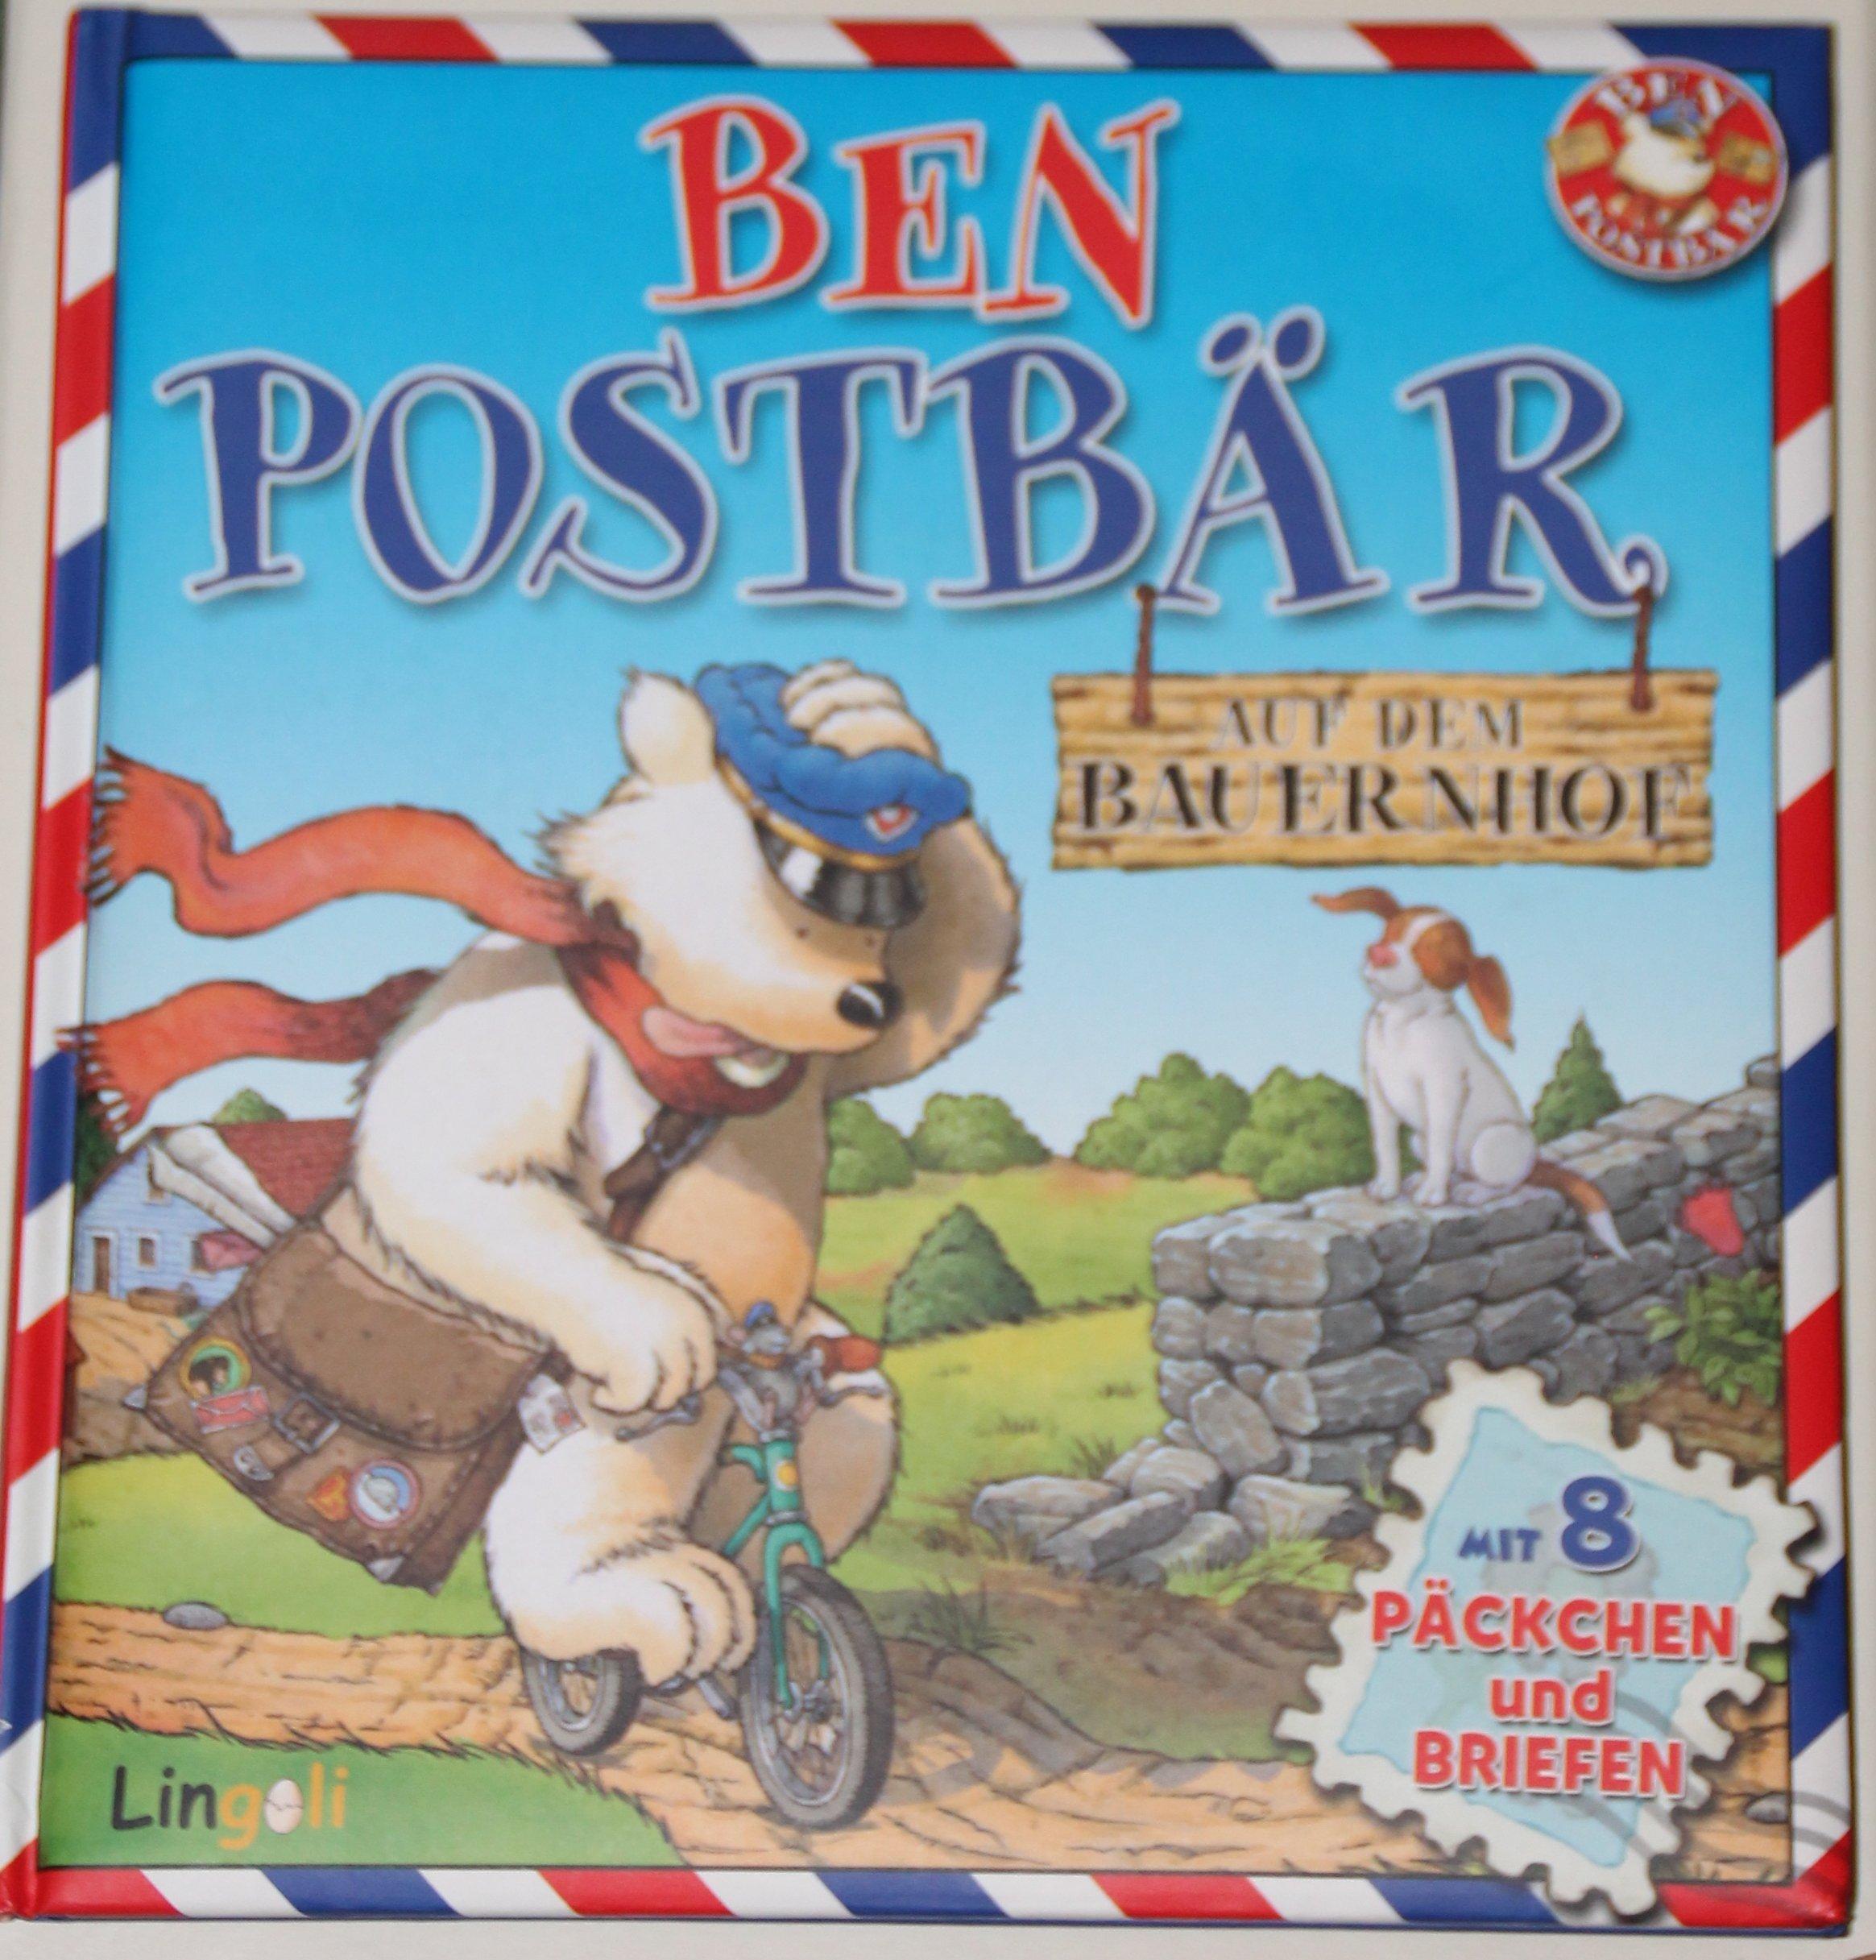 ben-postbr-auf-dem-bauernhof-lingoli